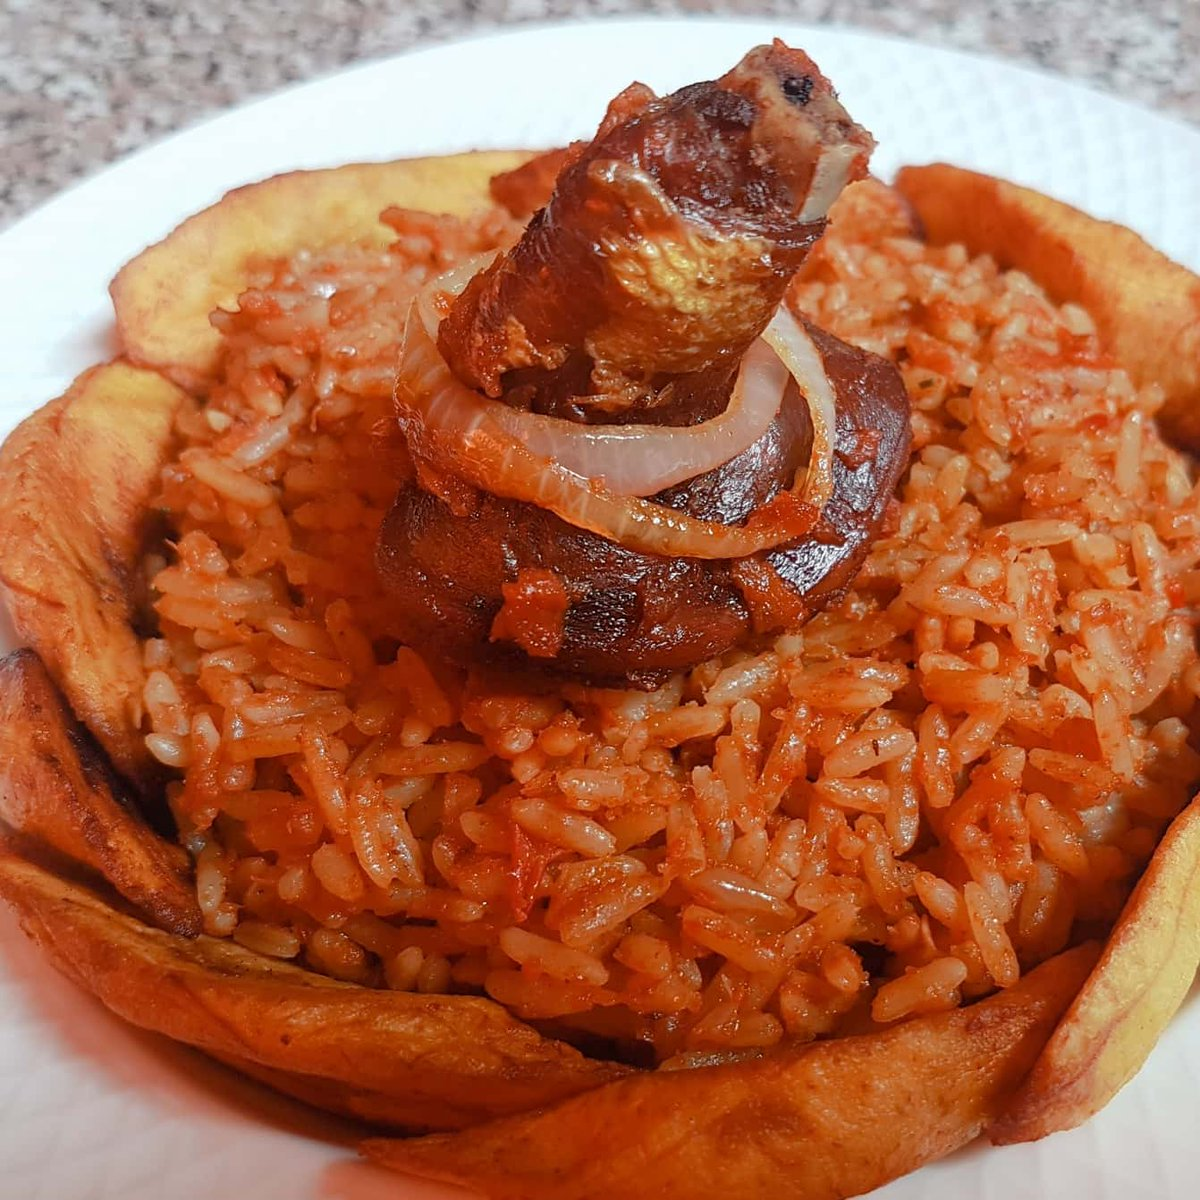 We make the best jollofrice in Lagos State. If you doubt me, order a bowl and taste for yourself  . . #NigerianCuisine #HealthyLiving #Nigeria #Nigerianfood #Business #LifeHack #BusinessHack #Lasgidi #Hustler  #FoodLovers #WorkingMums #FoodBlogger #FoodGoals #Naijastartups pic.twitter.com/Wq67FJIrXE